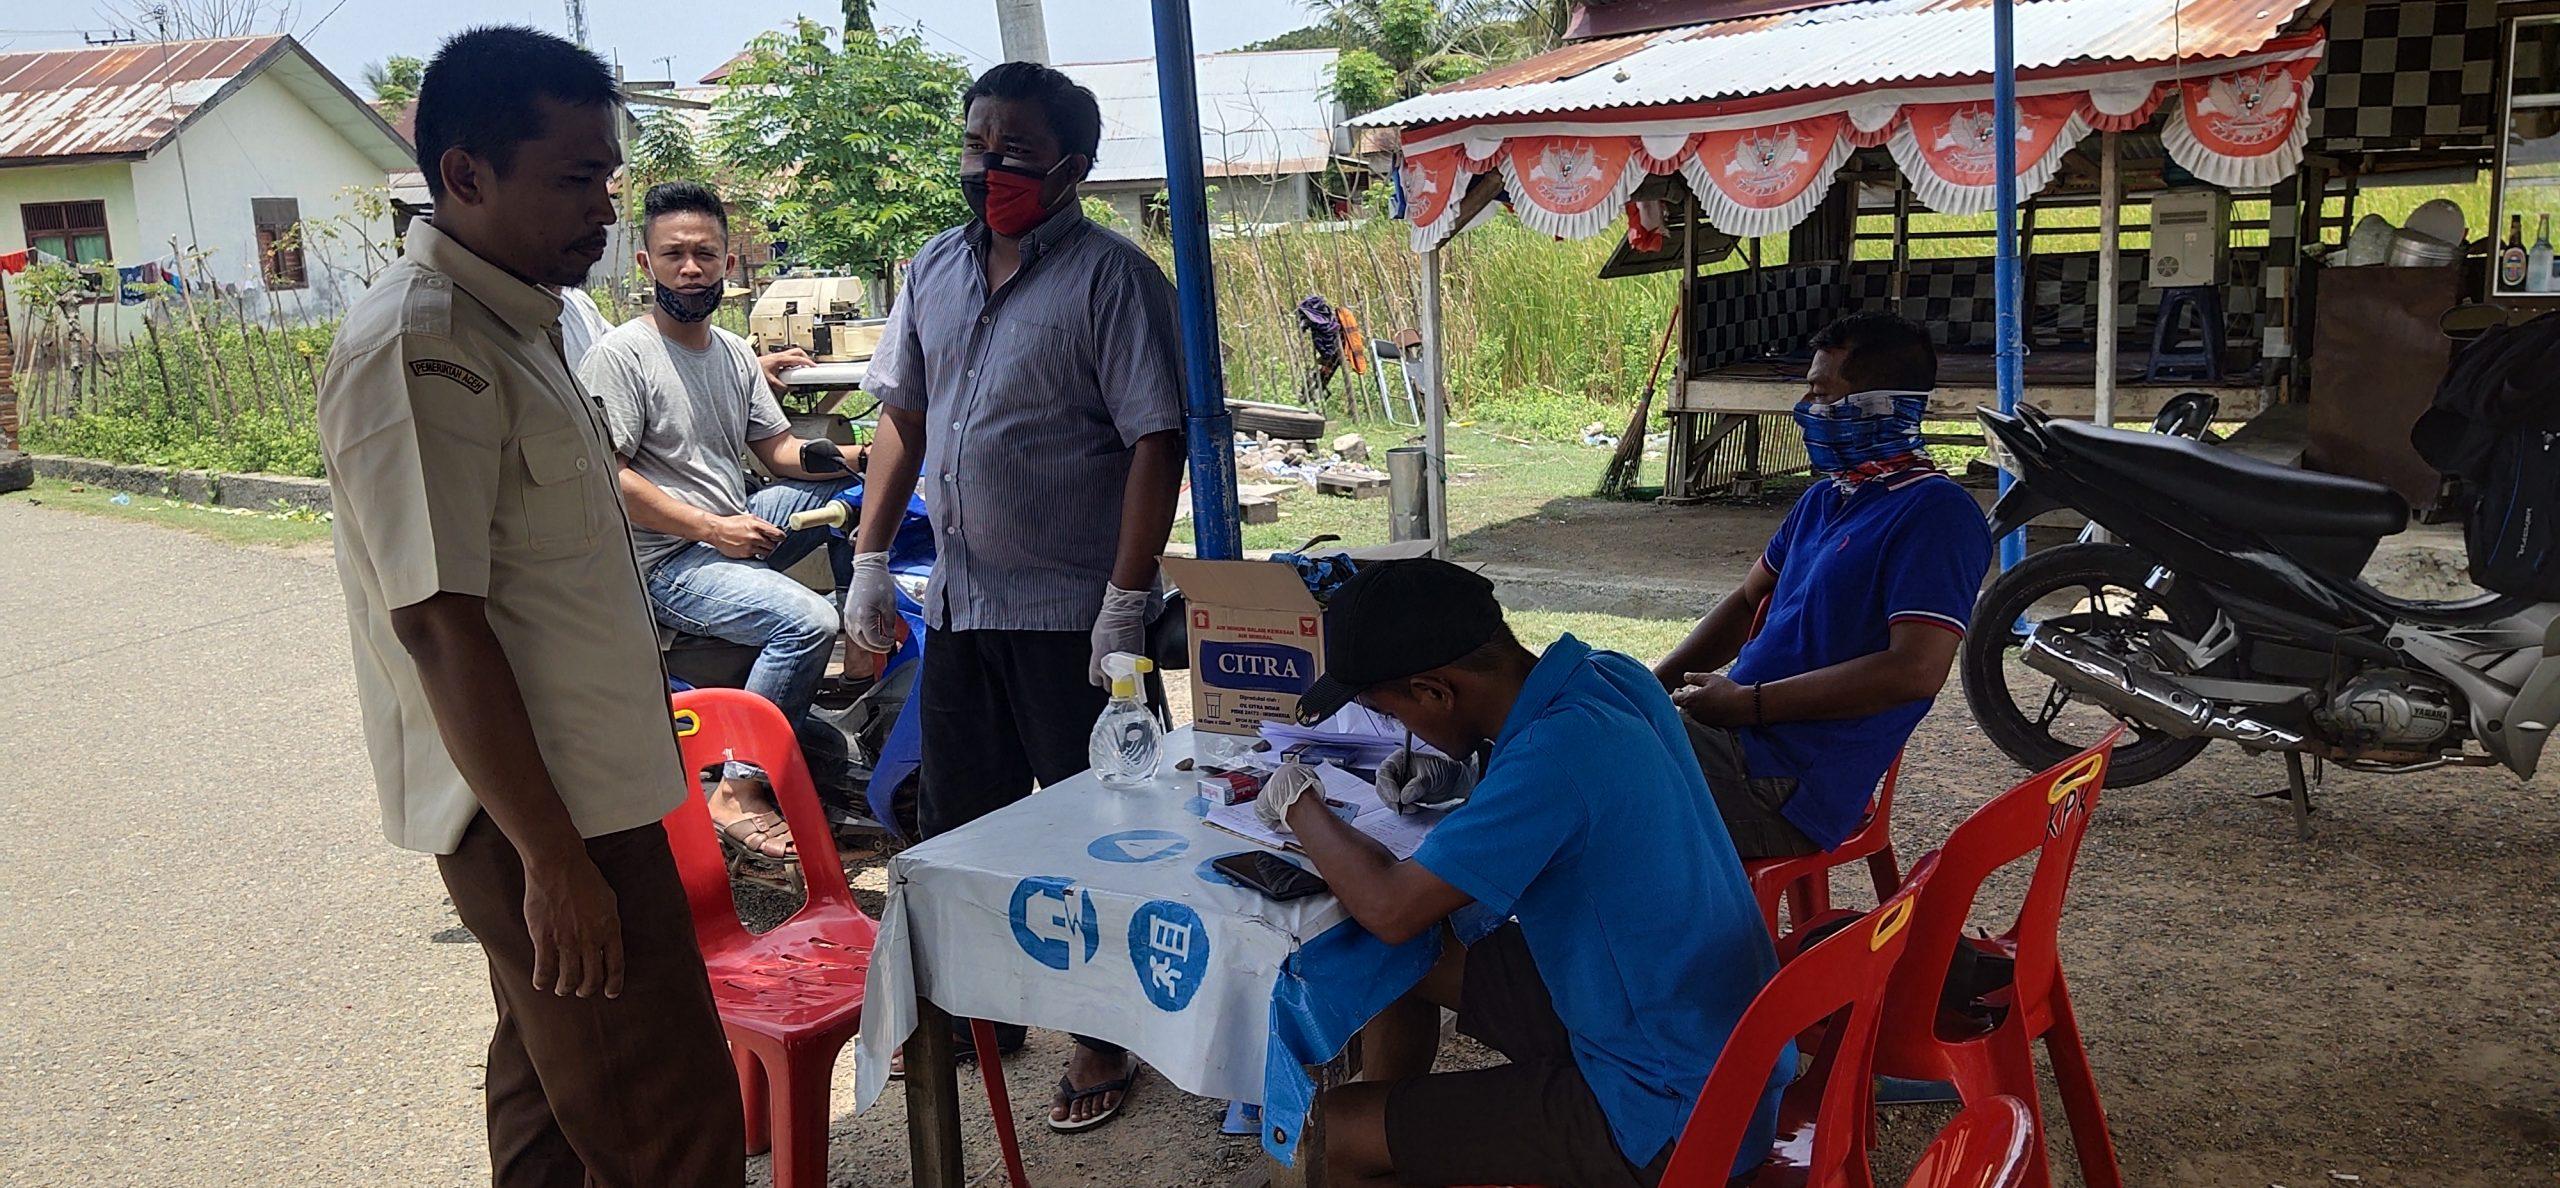 Pemuda Dusun Pola Keumala Kajhu Bentuk Posko Penanganan Covid-19